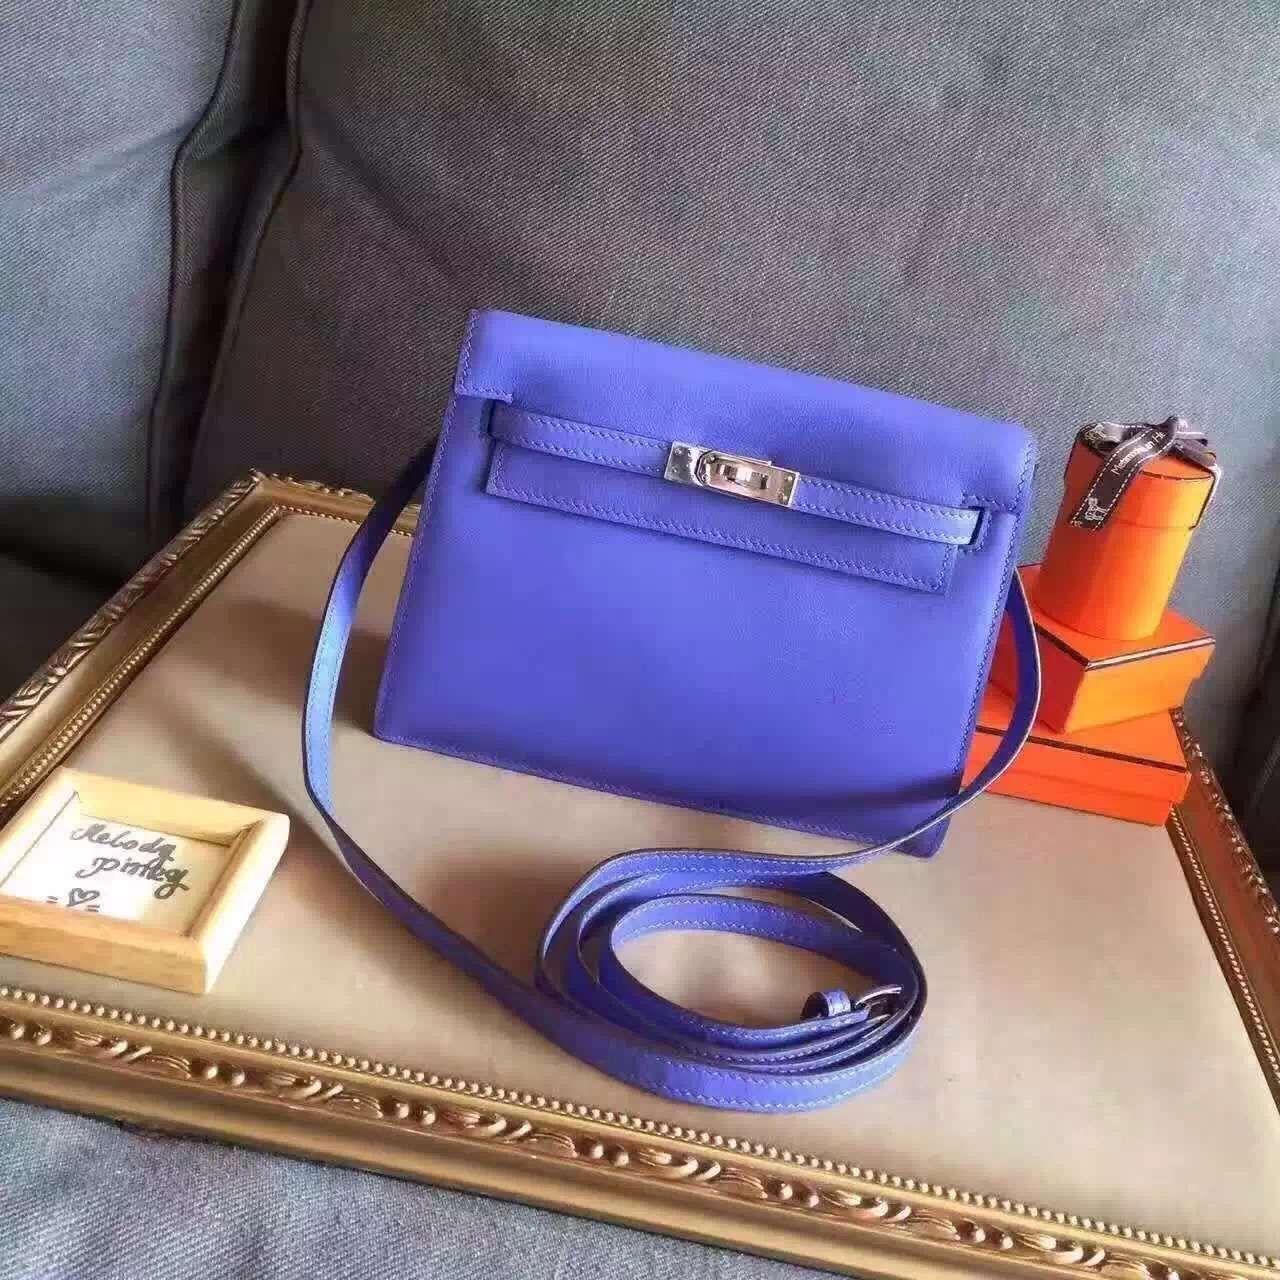 639641d464d8 Limited edition! Hermes kelly danse bag purple